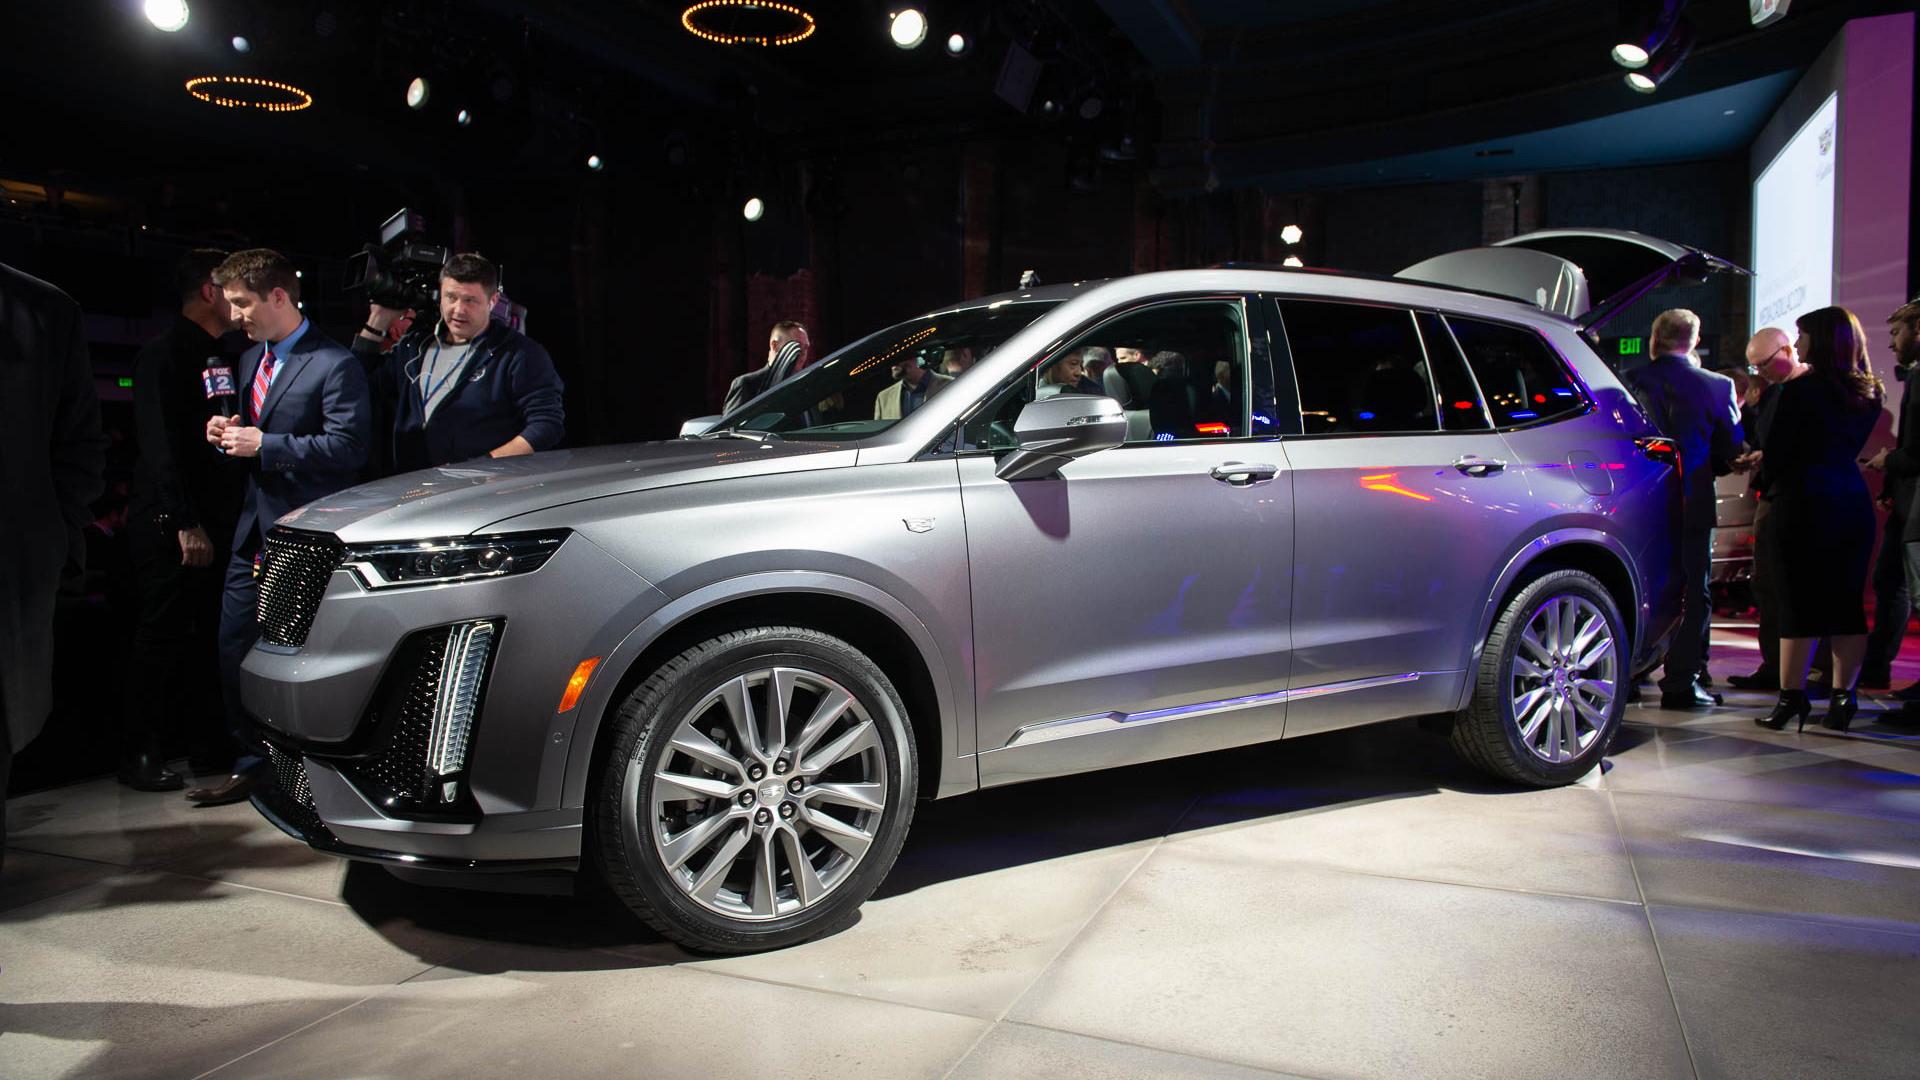 2020 Cadillac XT6, 2019 Detroit auto show